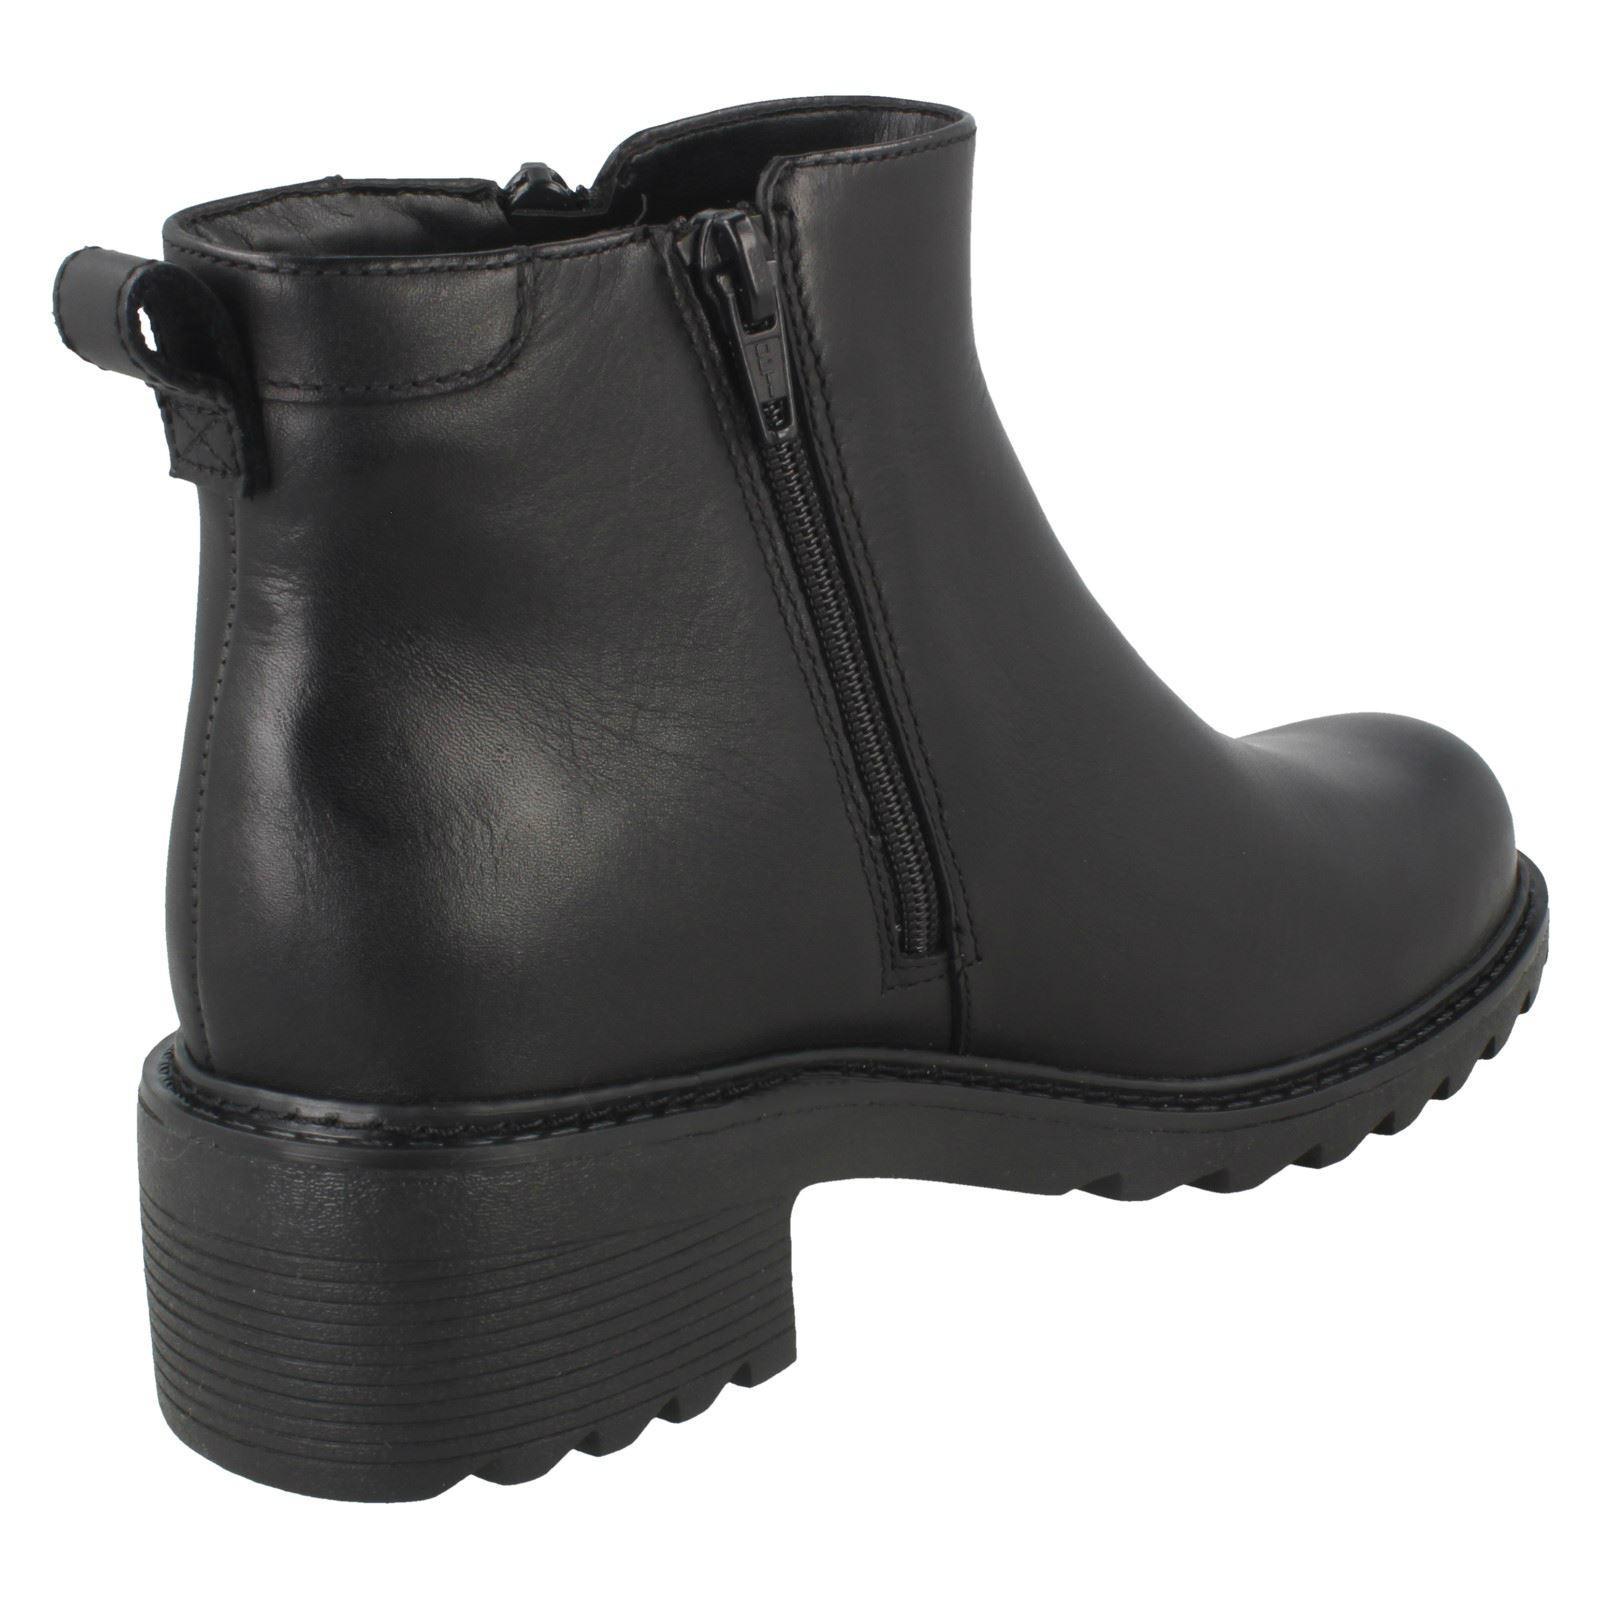 Girls Clarks Zip Up Casual Boots Frankie Roam